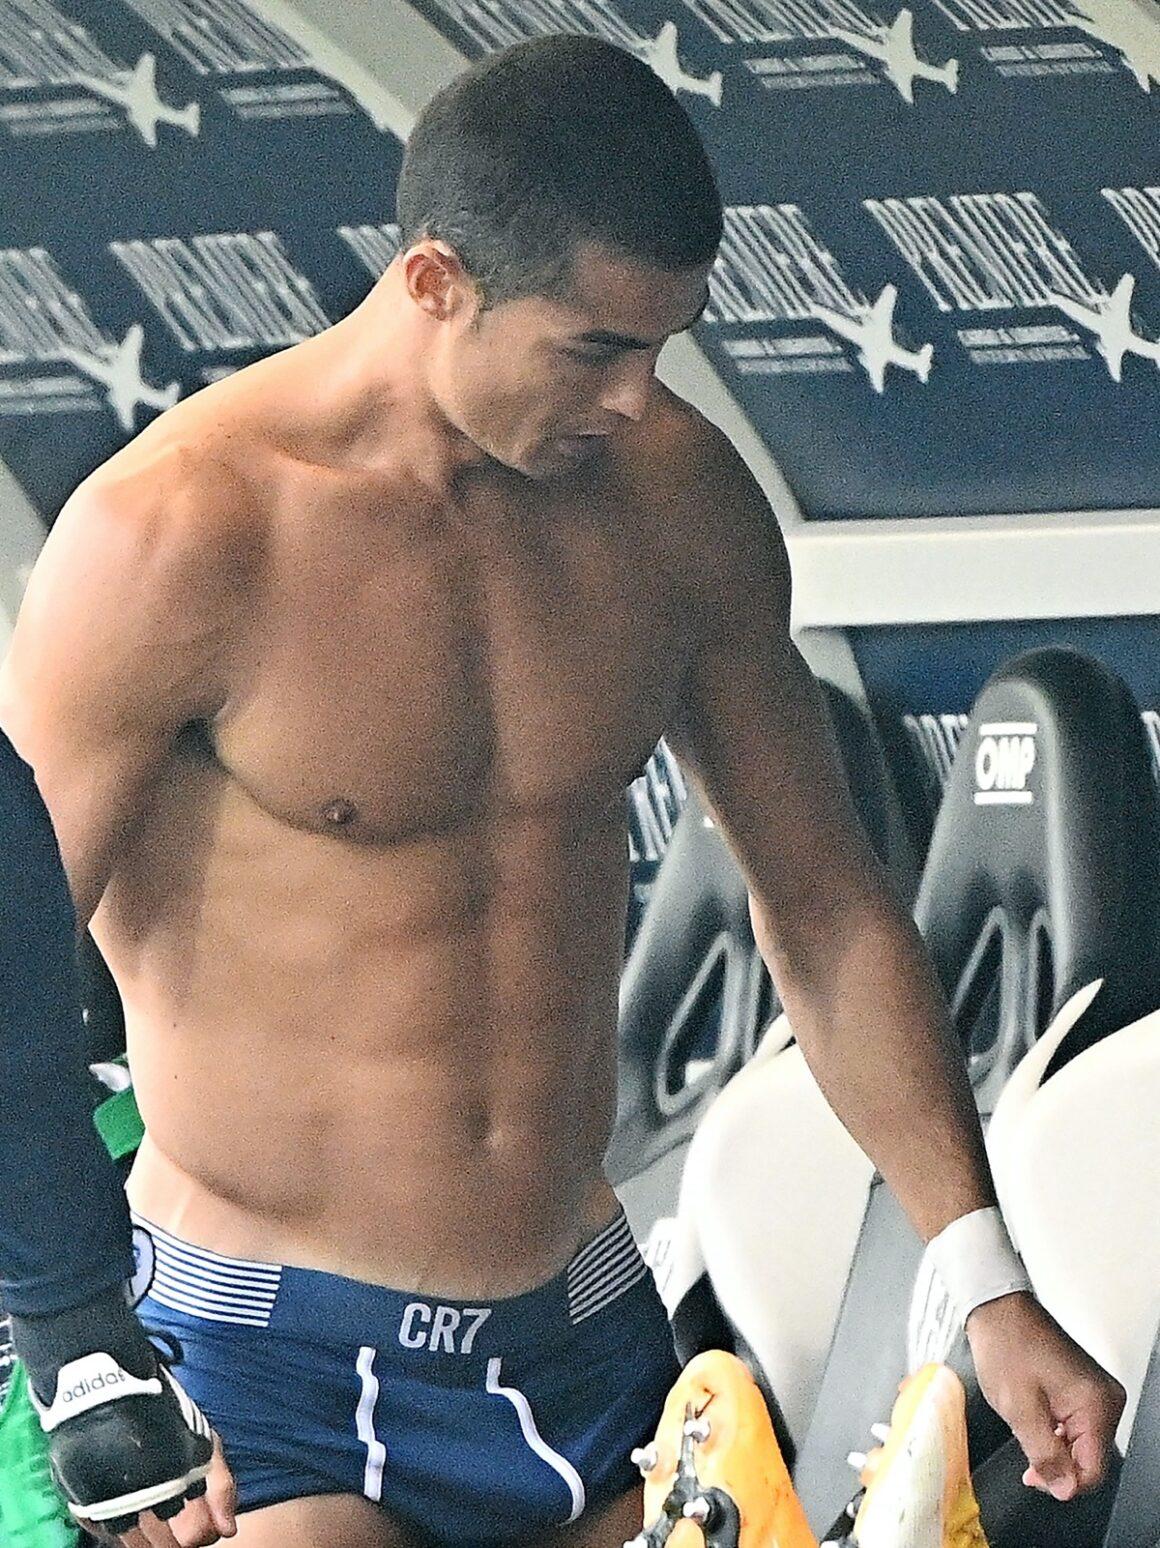 Cristiano Ronaldo shows off abs